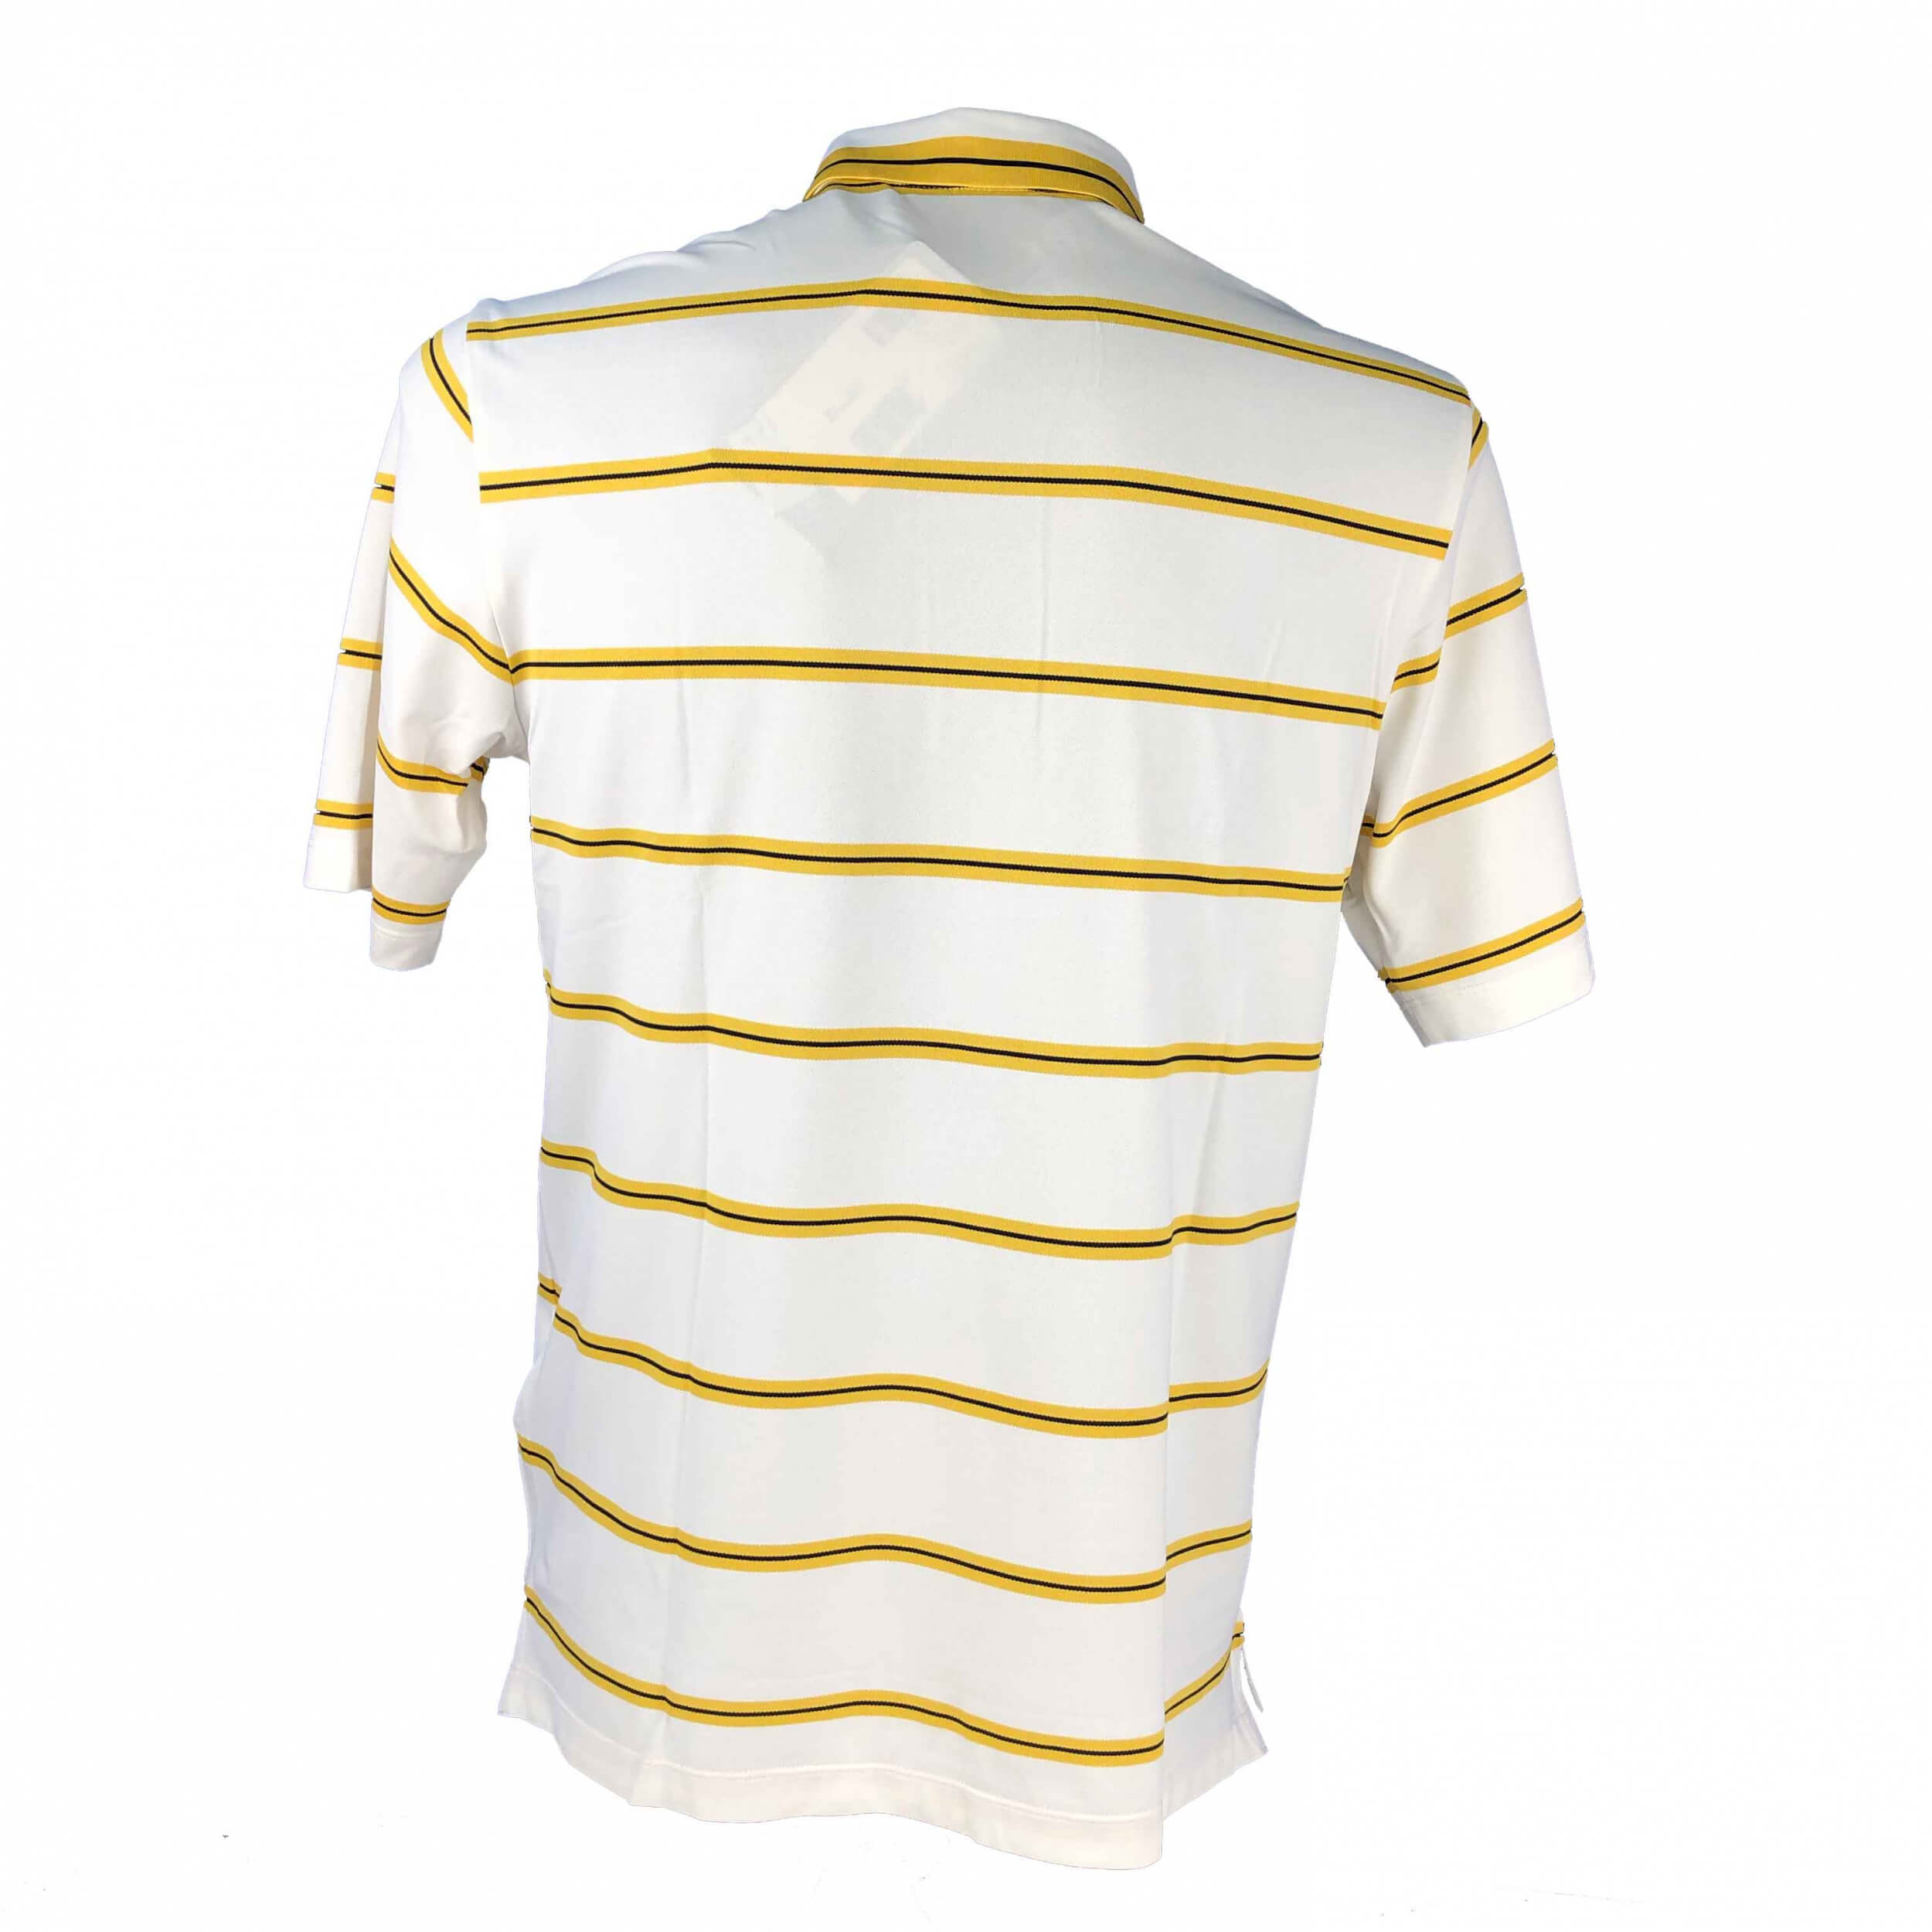 Chervo Herren Polo Abruzzo DRY MATIC weiß gelb 29B neu